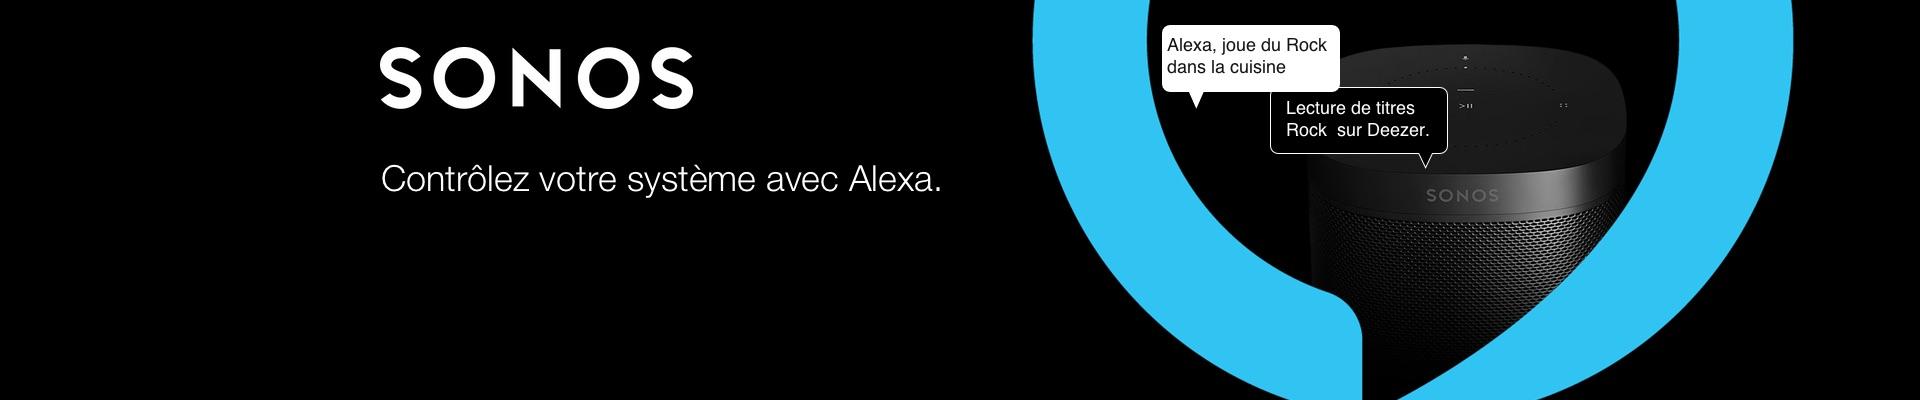 slide-201808-alexa-sonos